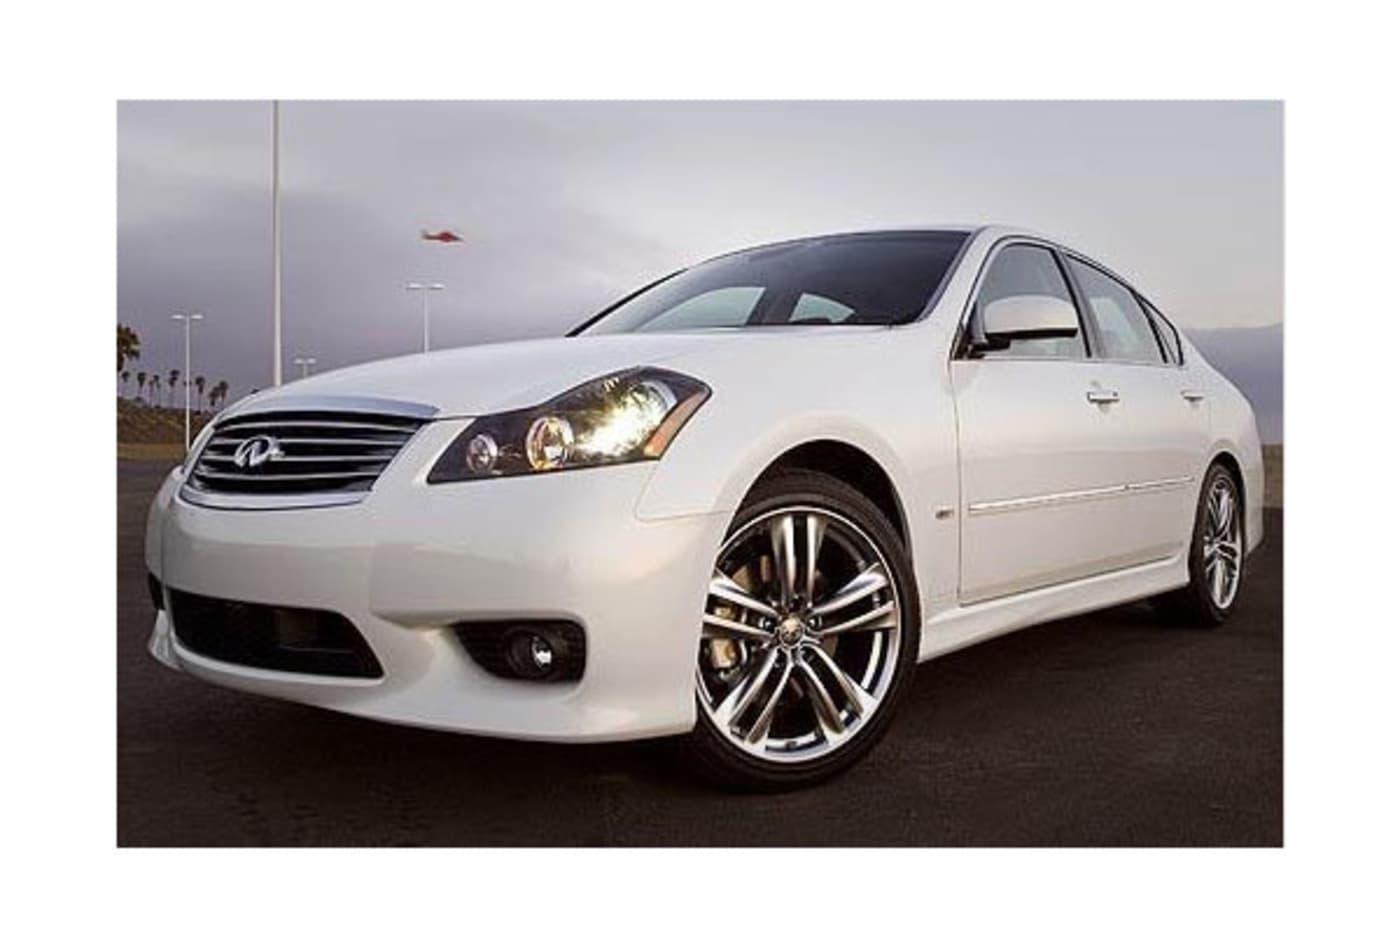 48438691 Infiniti-M45-Most-Stolen-Luxury-Cars-CNBC.jpg